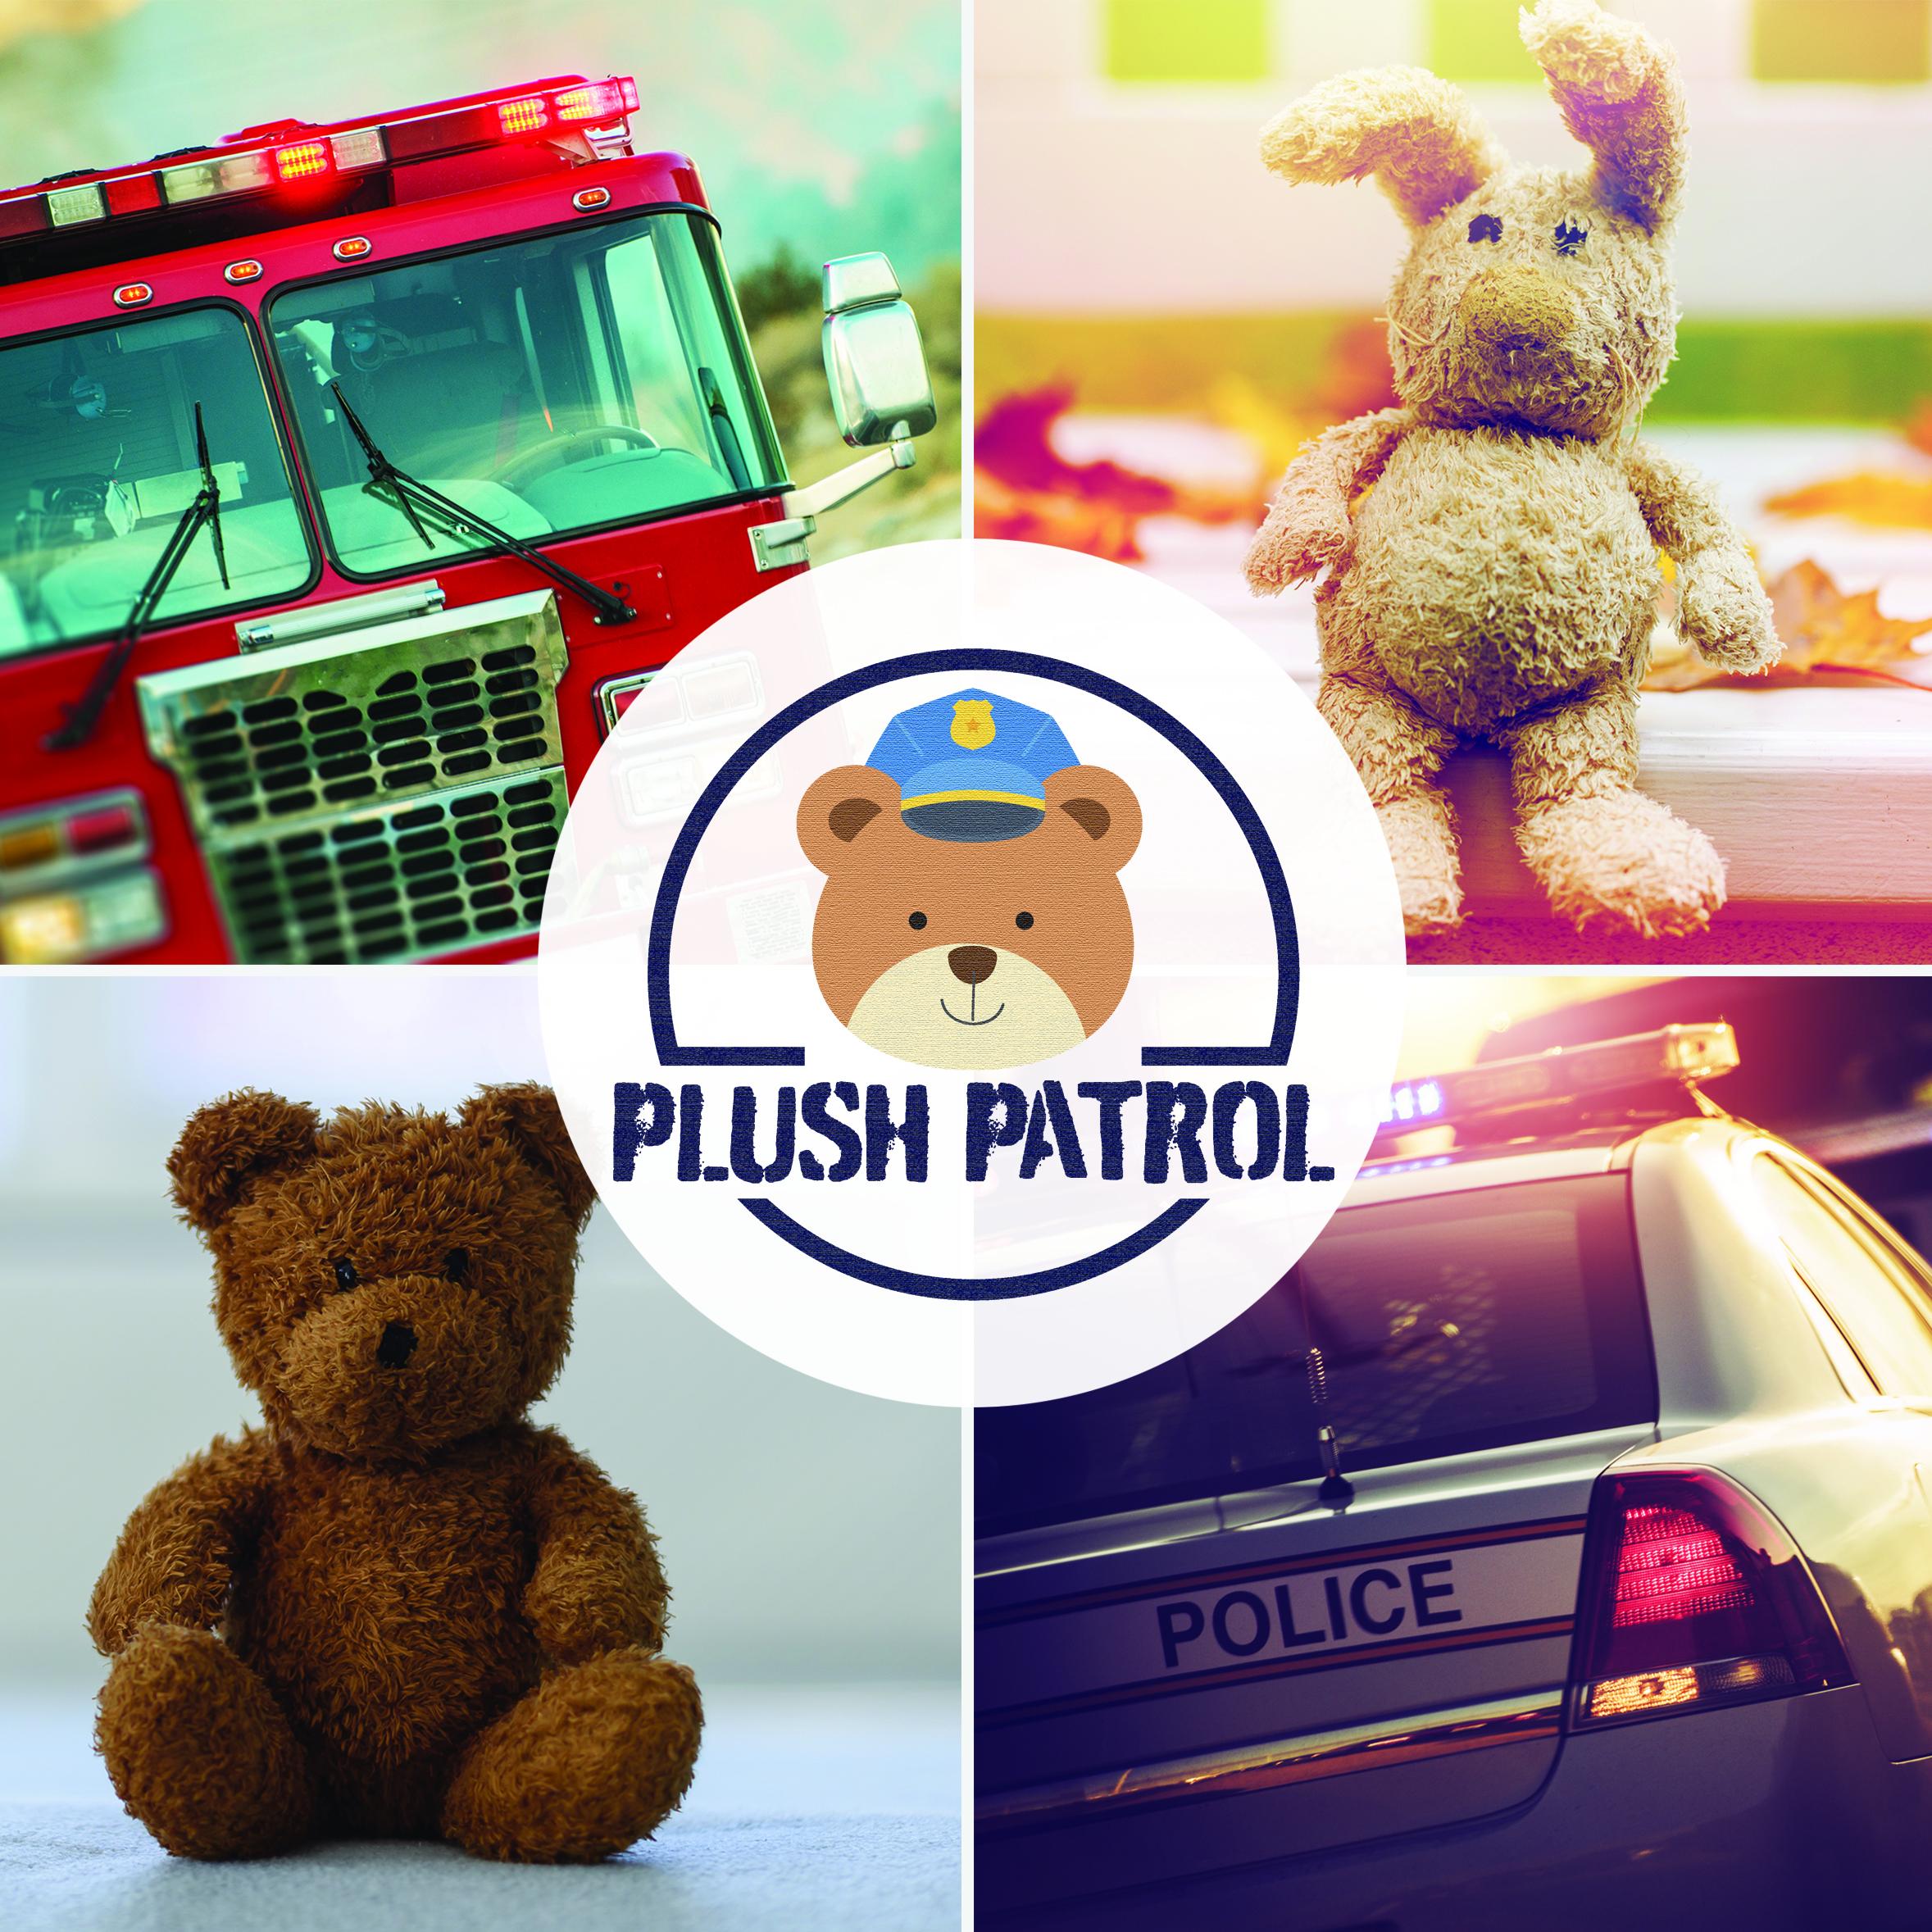 Plush Patrol